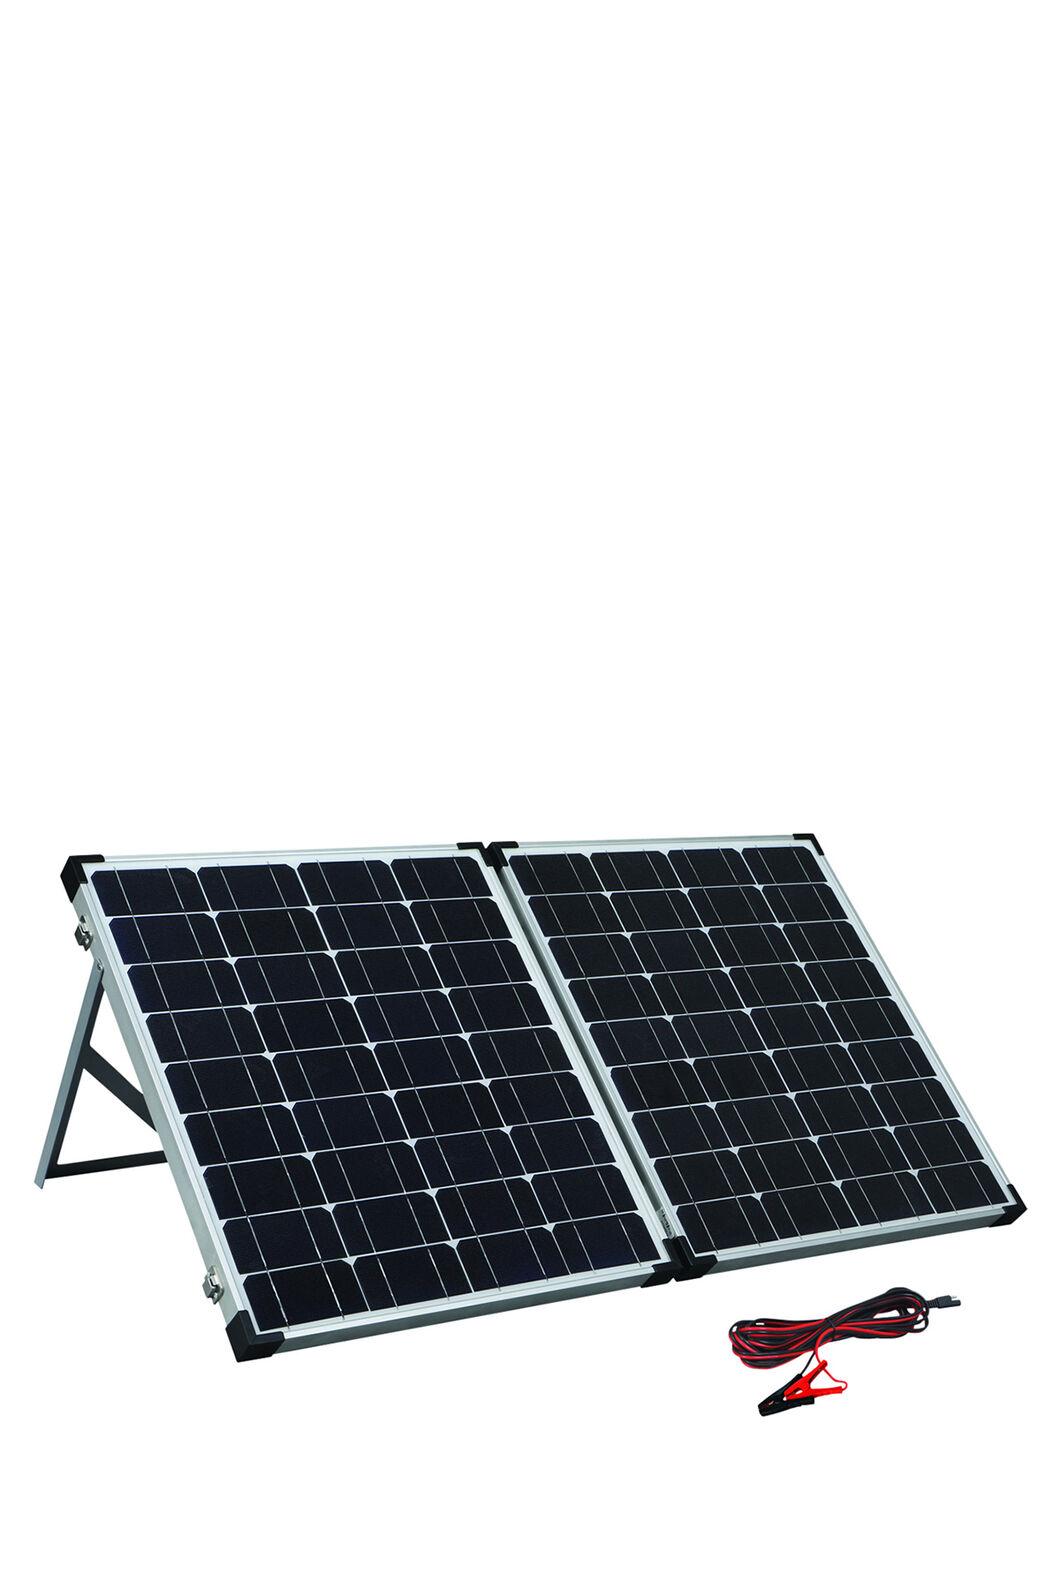 Solution X 100W Folding Solar Panel Kit, None, hi-res